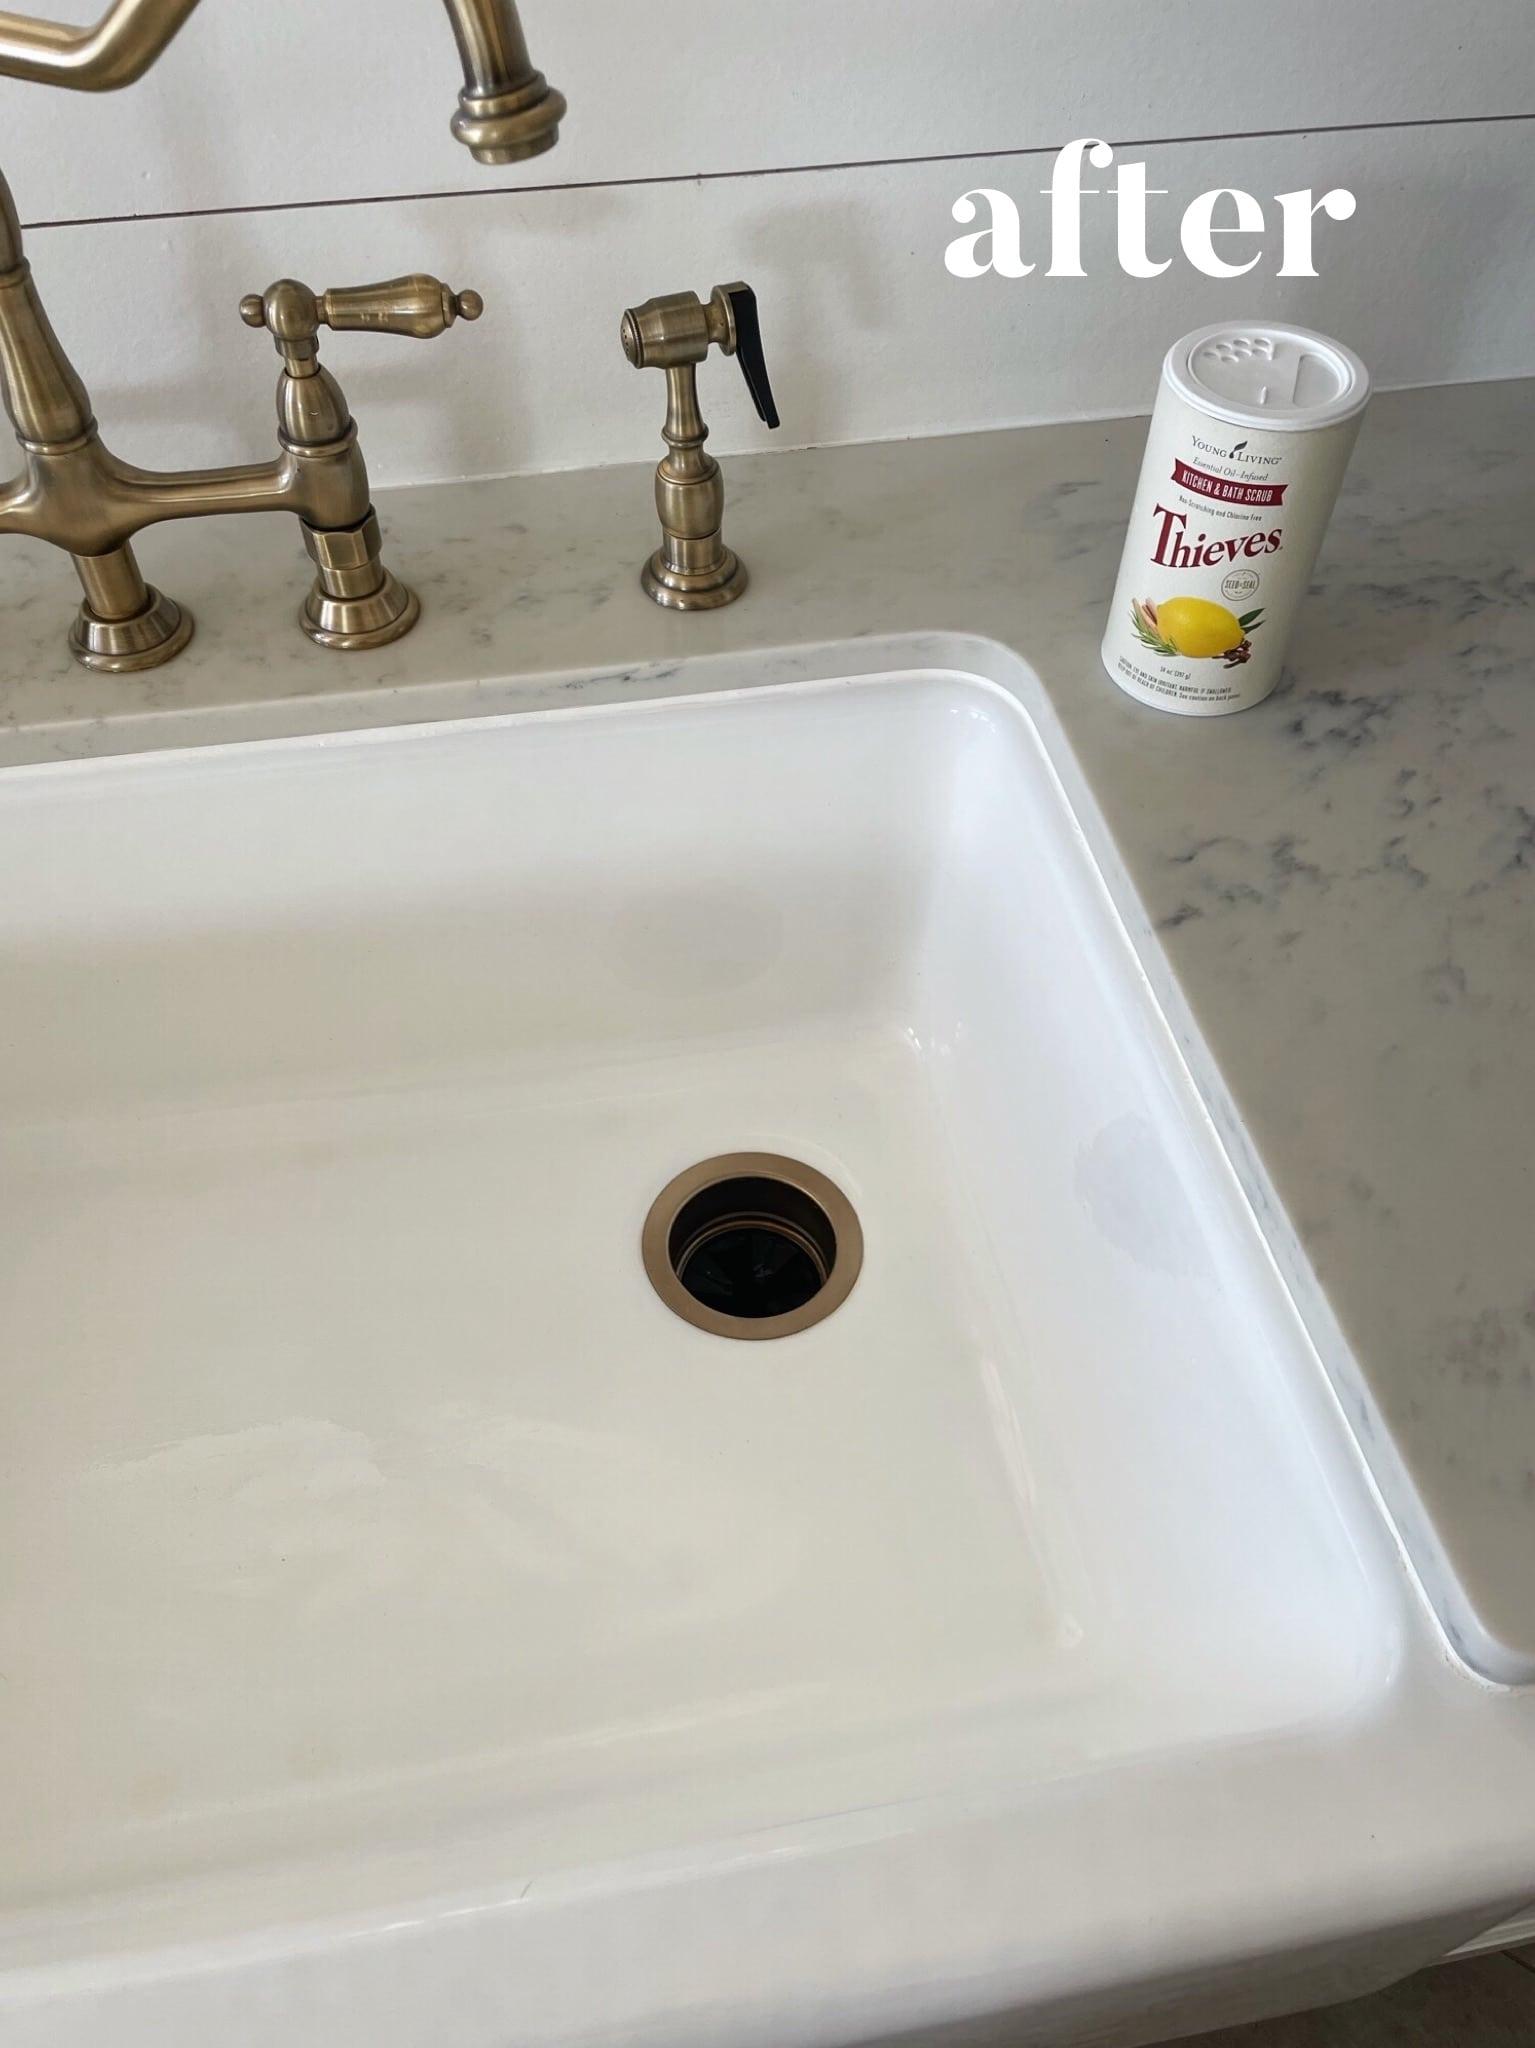 Six Simple Secrets for a Shiny Sink